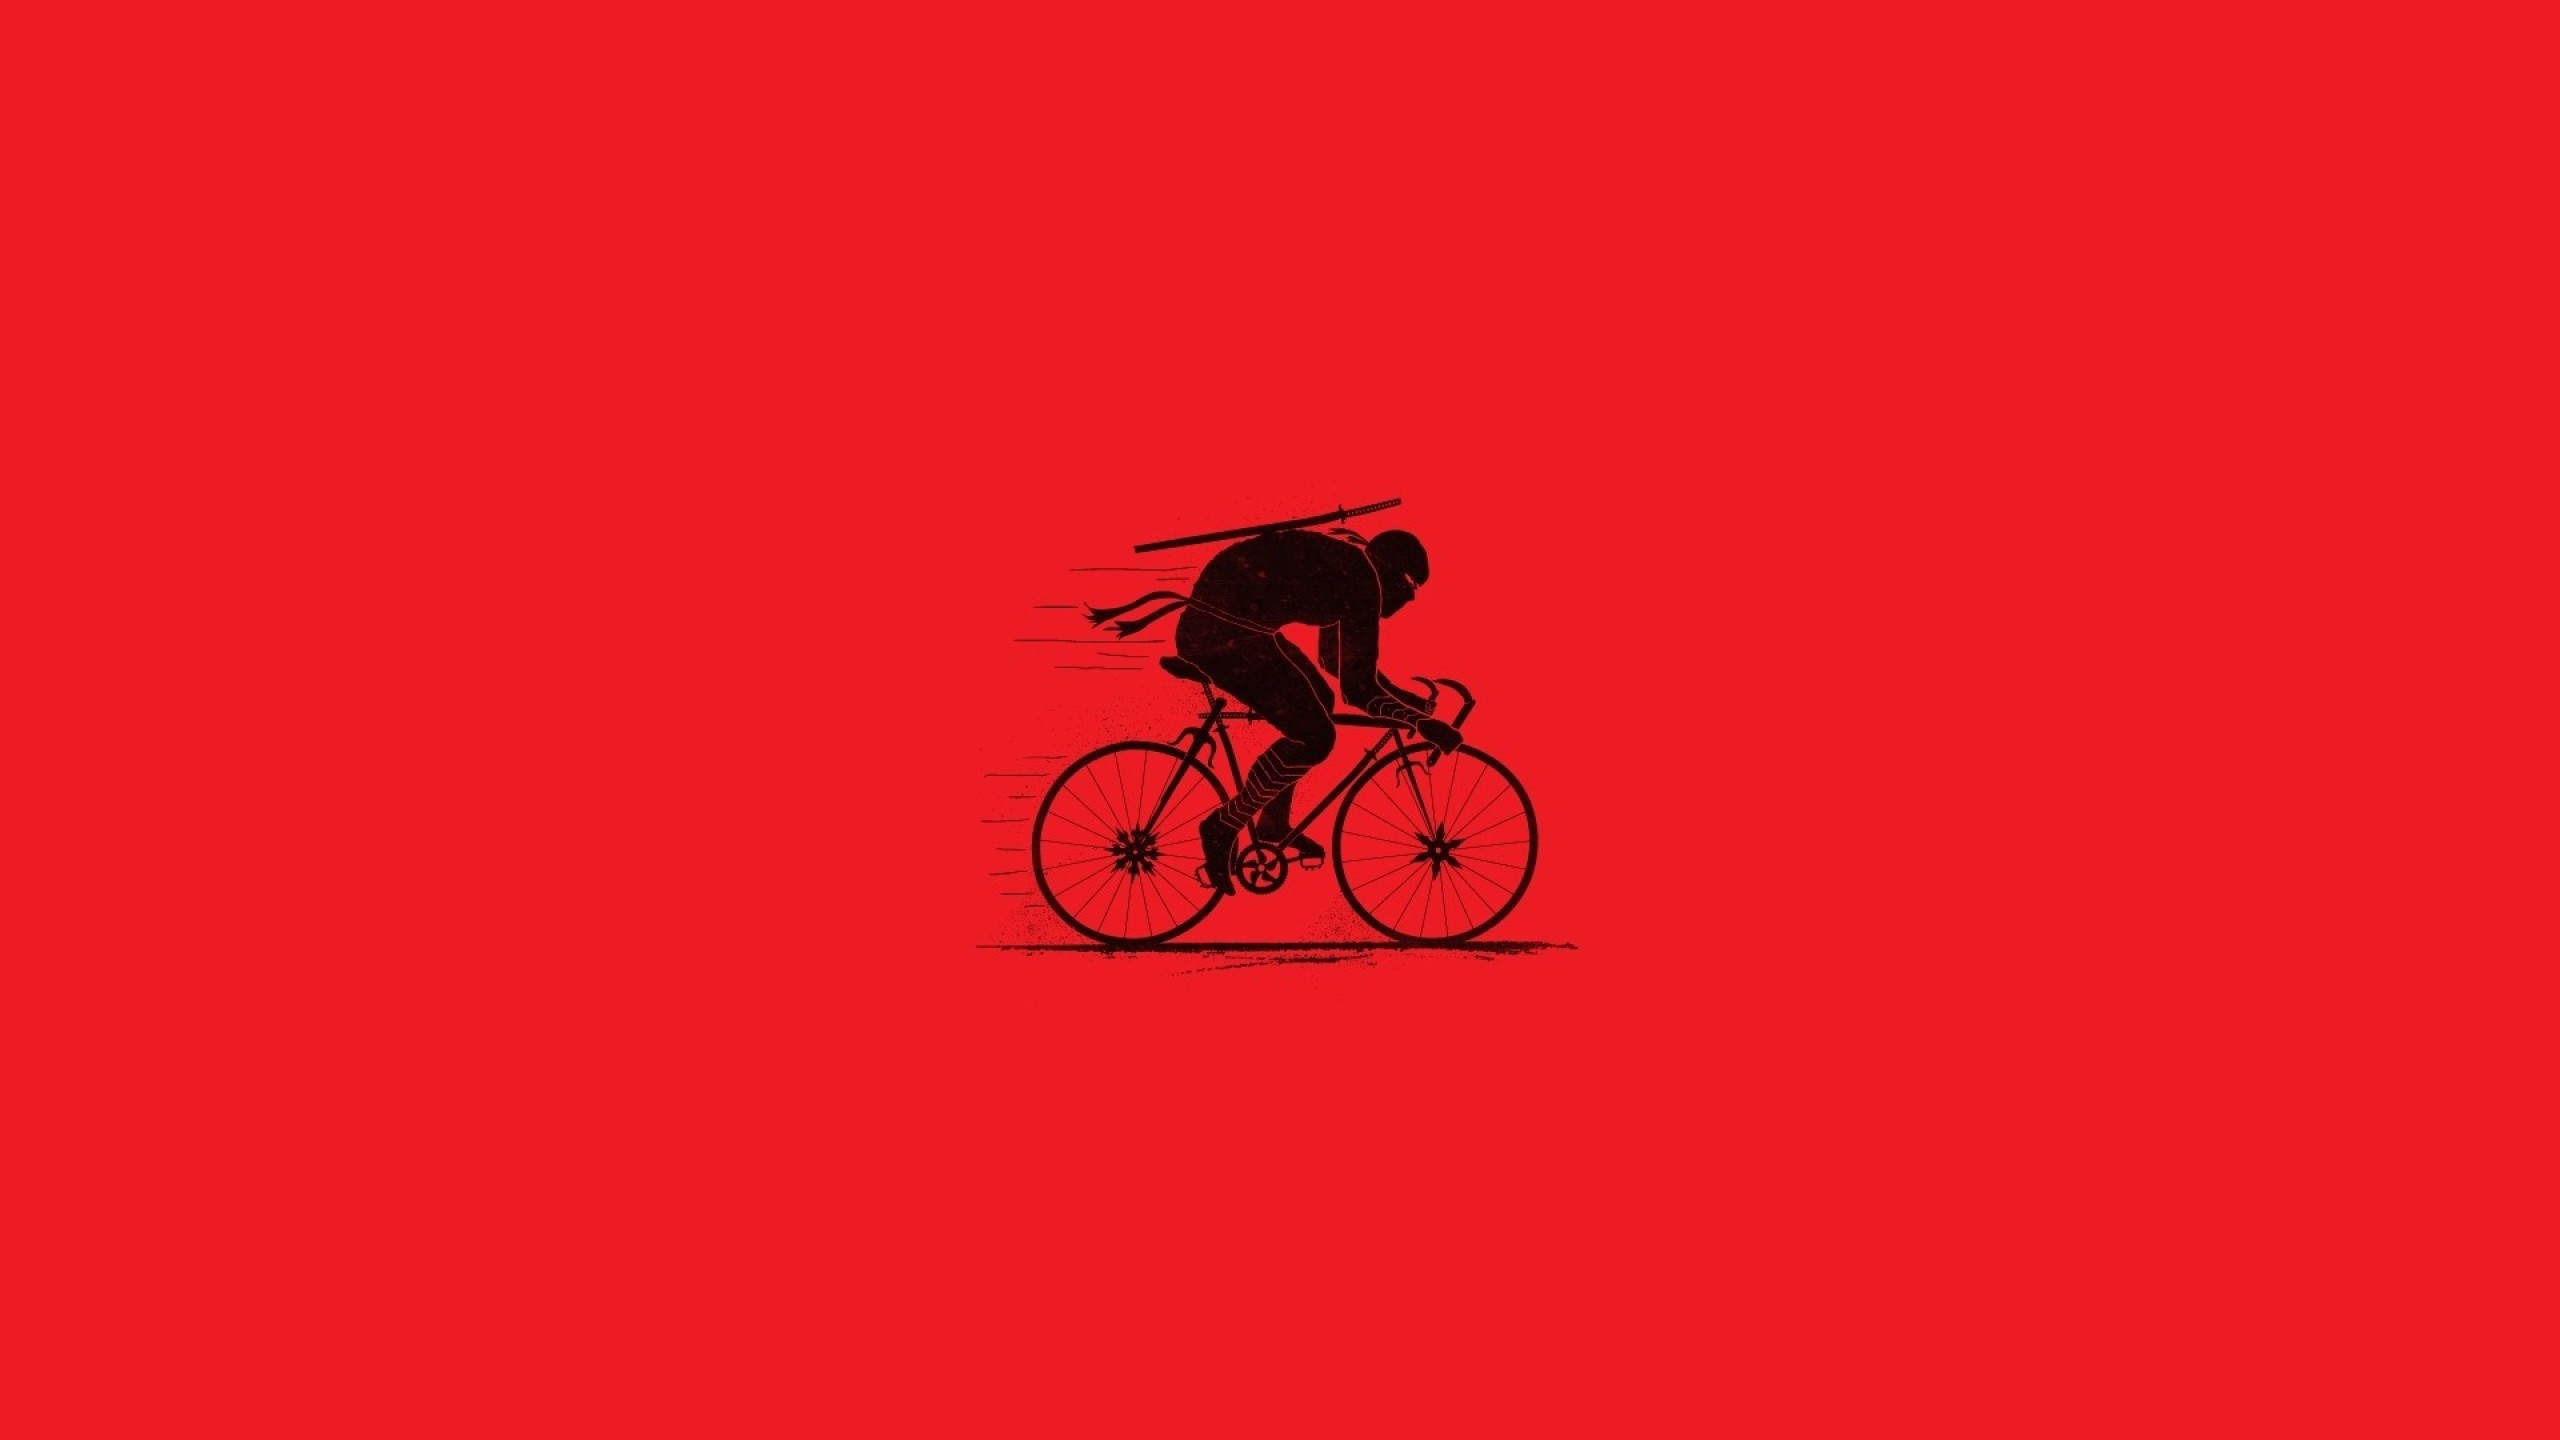 Ghost Rider Bike Hd Wallpaper Free Ninja Wallpapers Download Pixelstalk Net